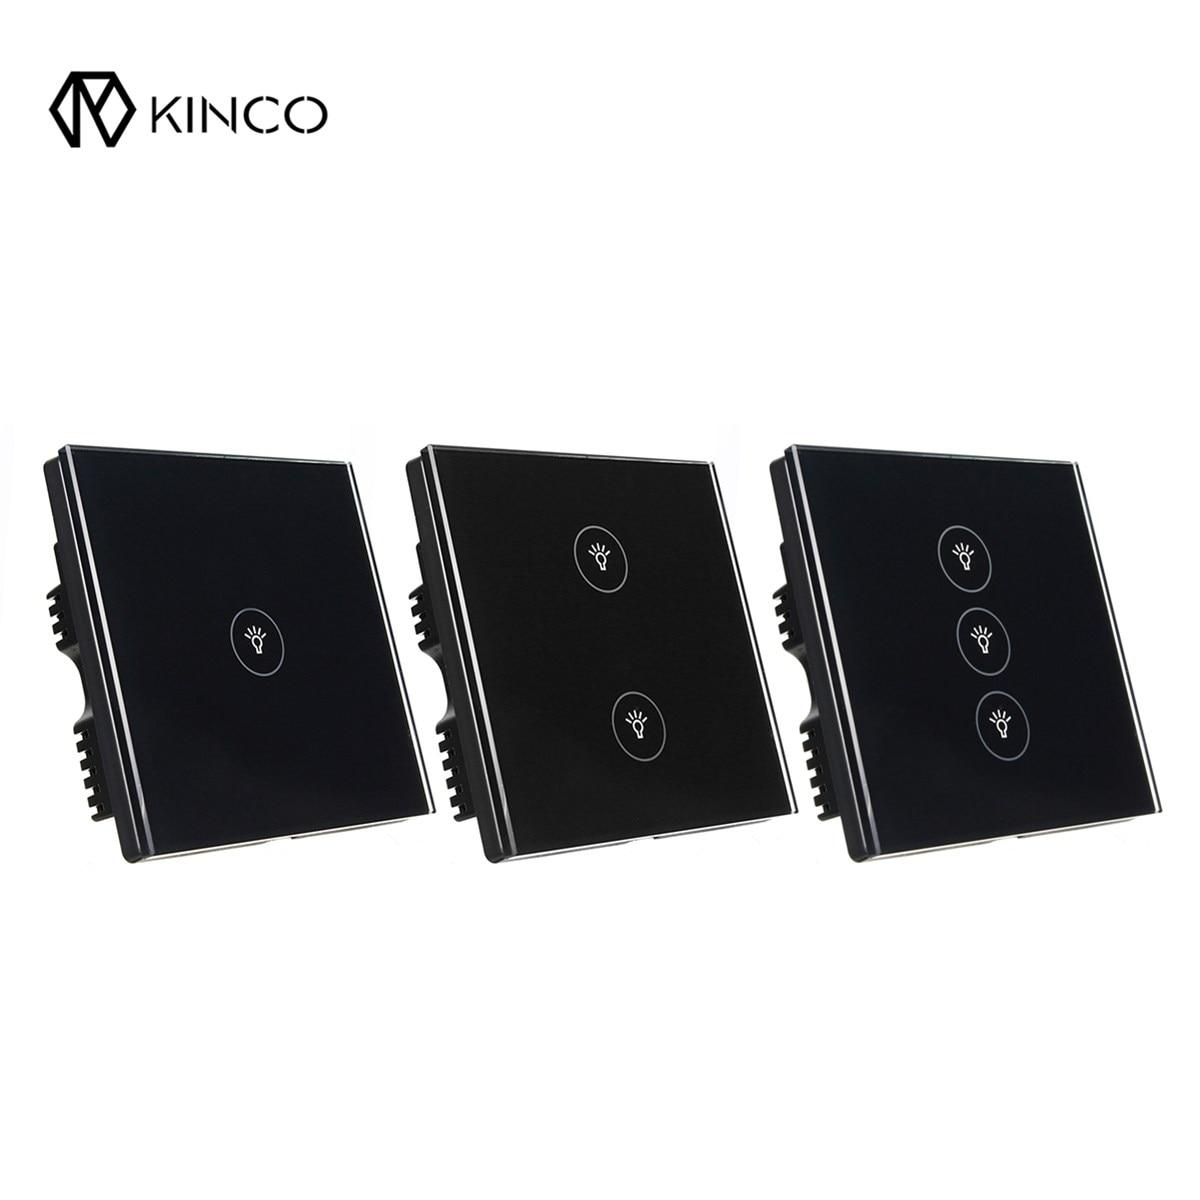 KINCO Black UK 10A 1/2/3 Gang Smart Switch Panel Timing Smar